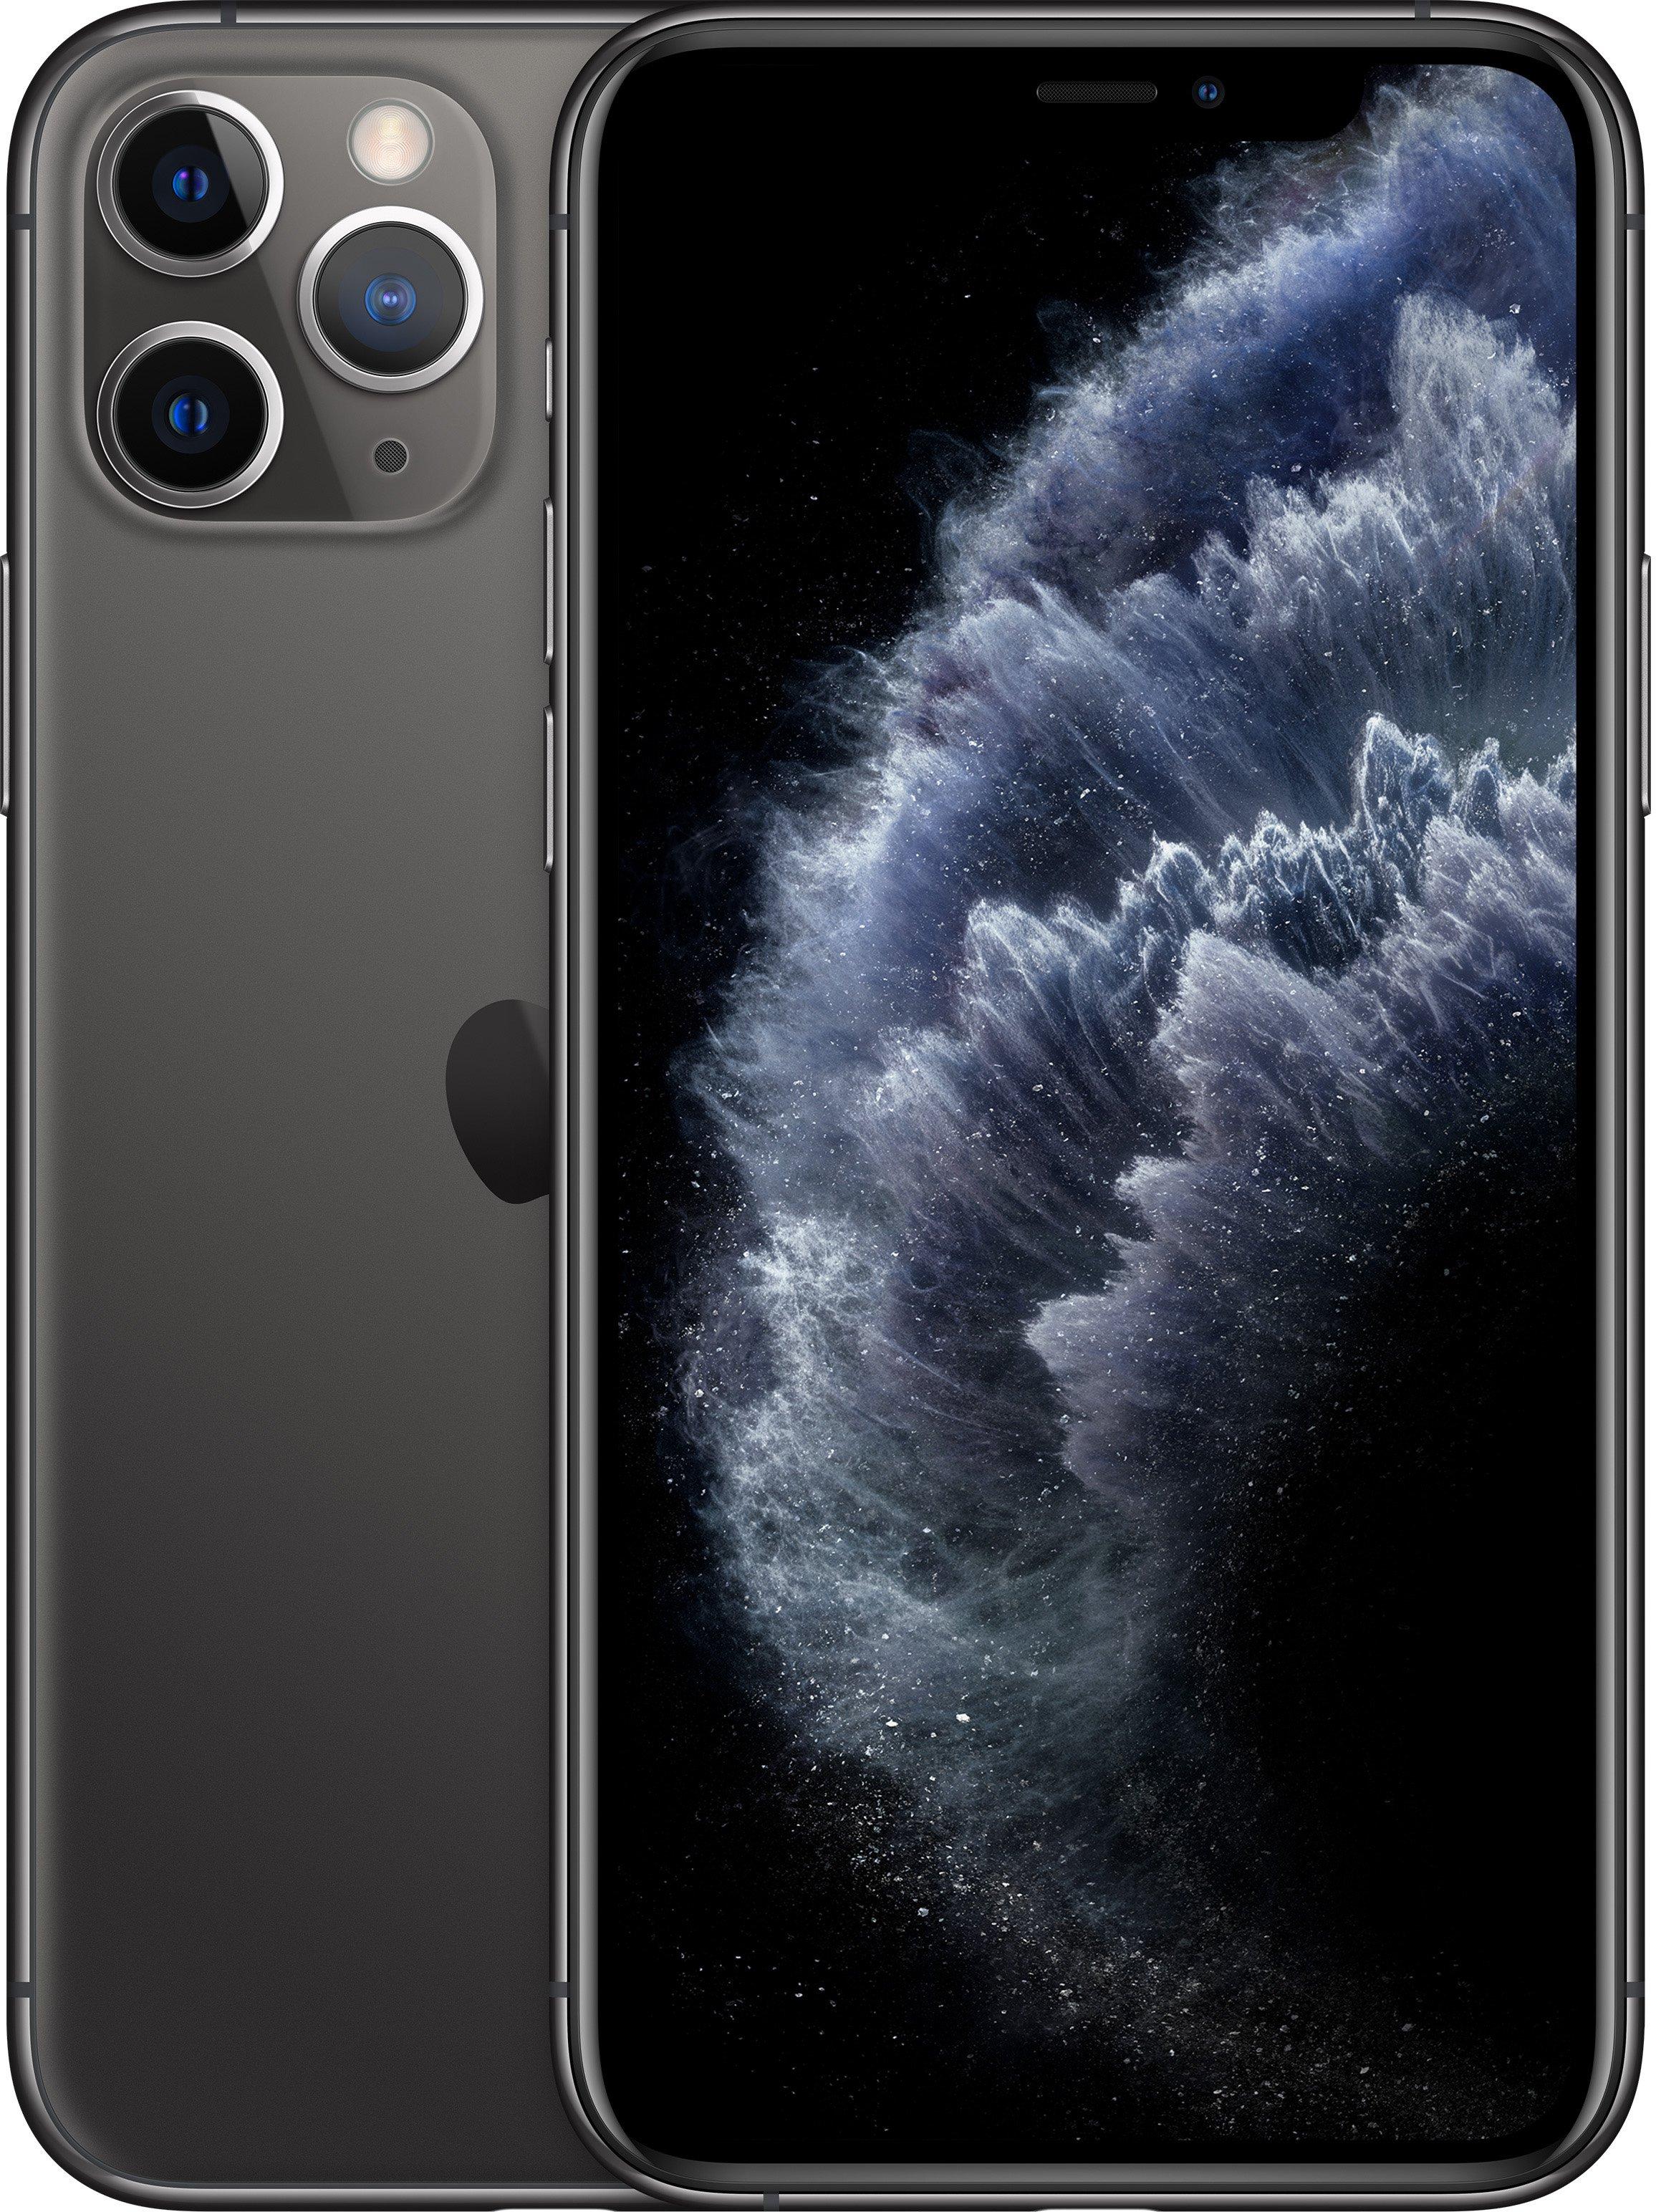 Смартфон Apple iPhone 11 Pro Max: где купить, цены, характеристики